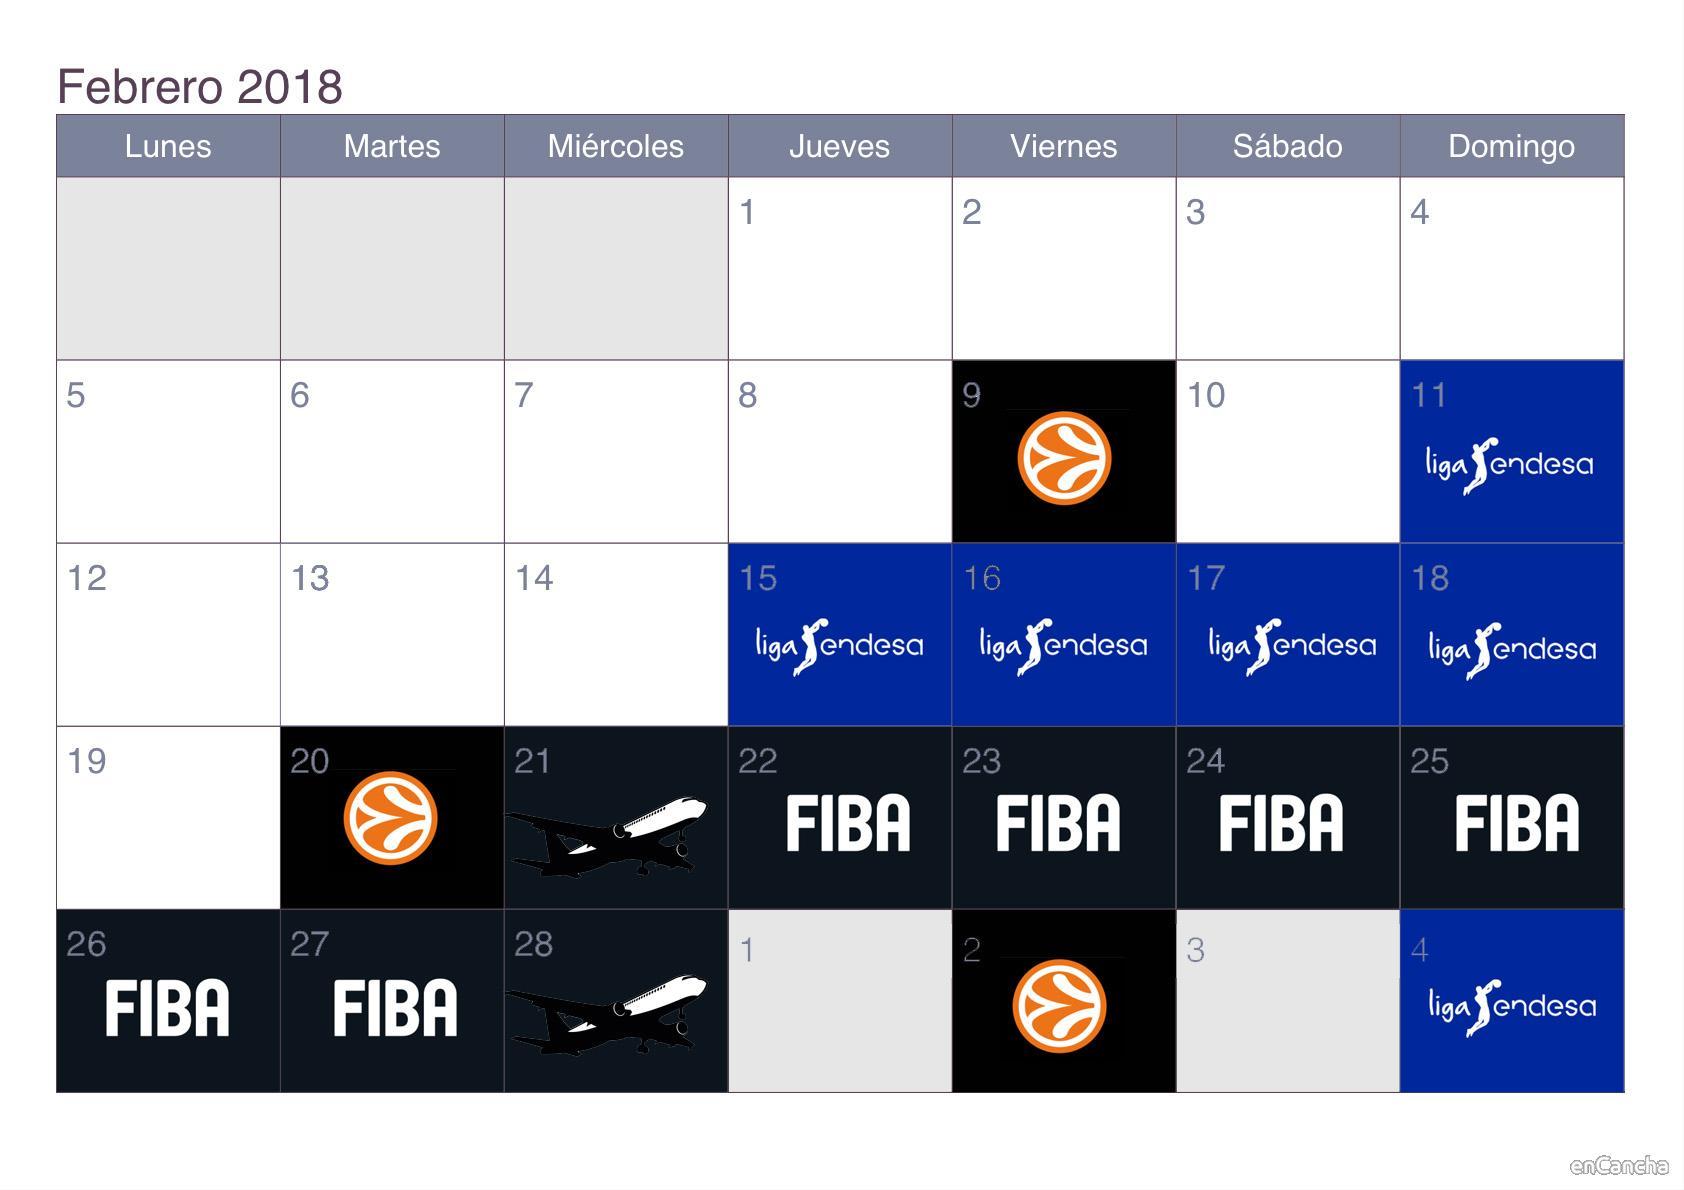 Calendario de la ventana FIBA de febrero